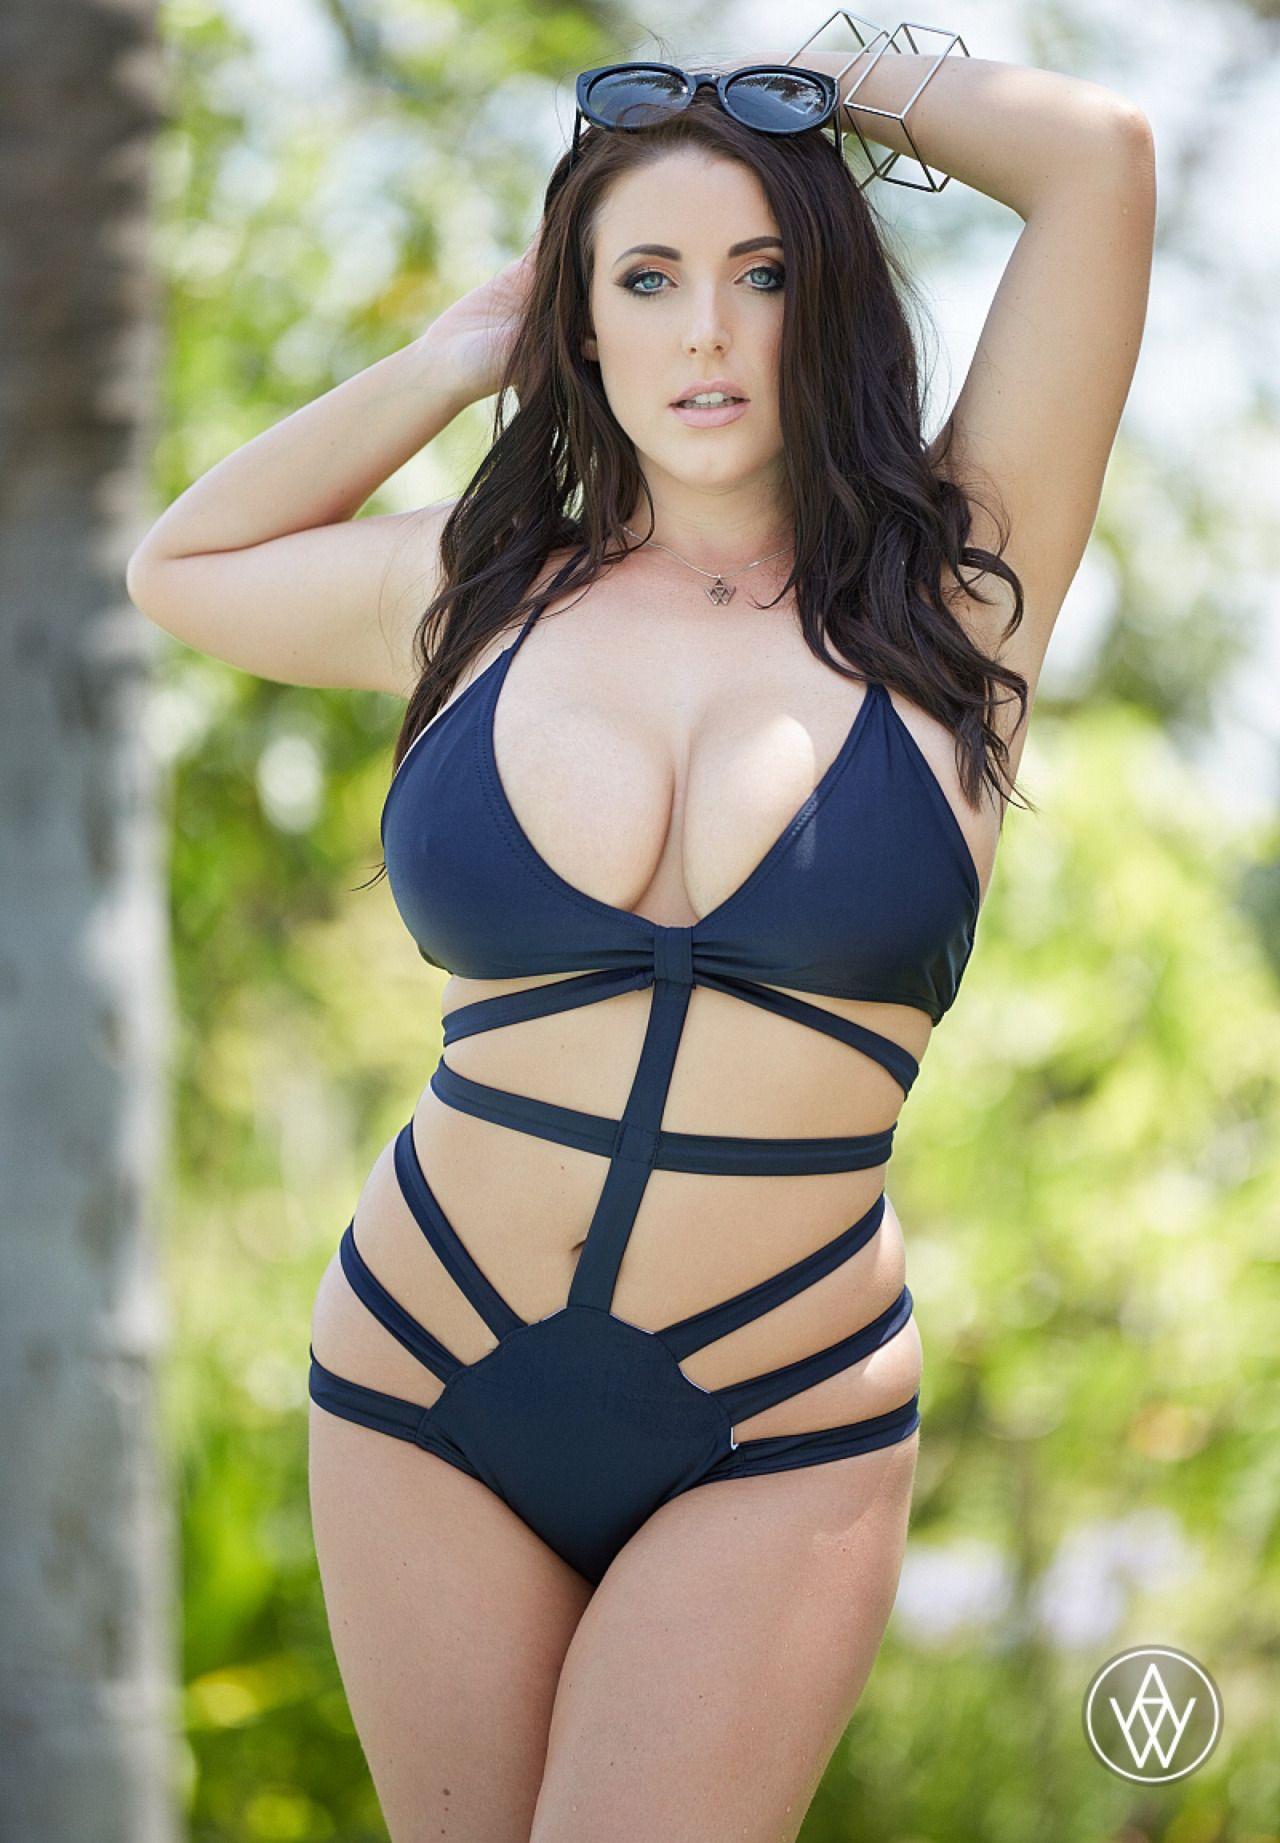 Nude woman pornstar white